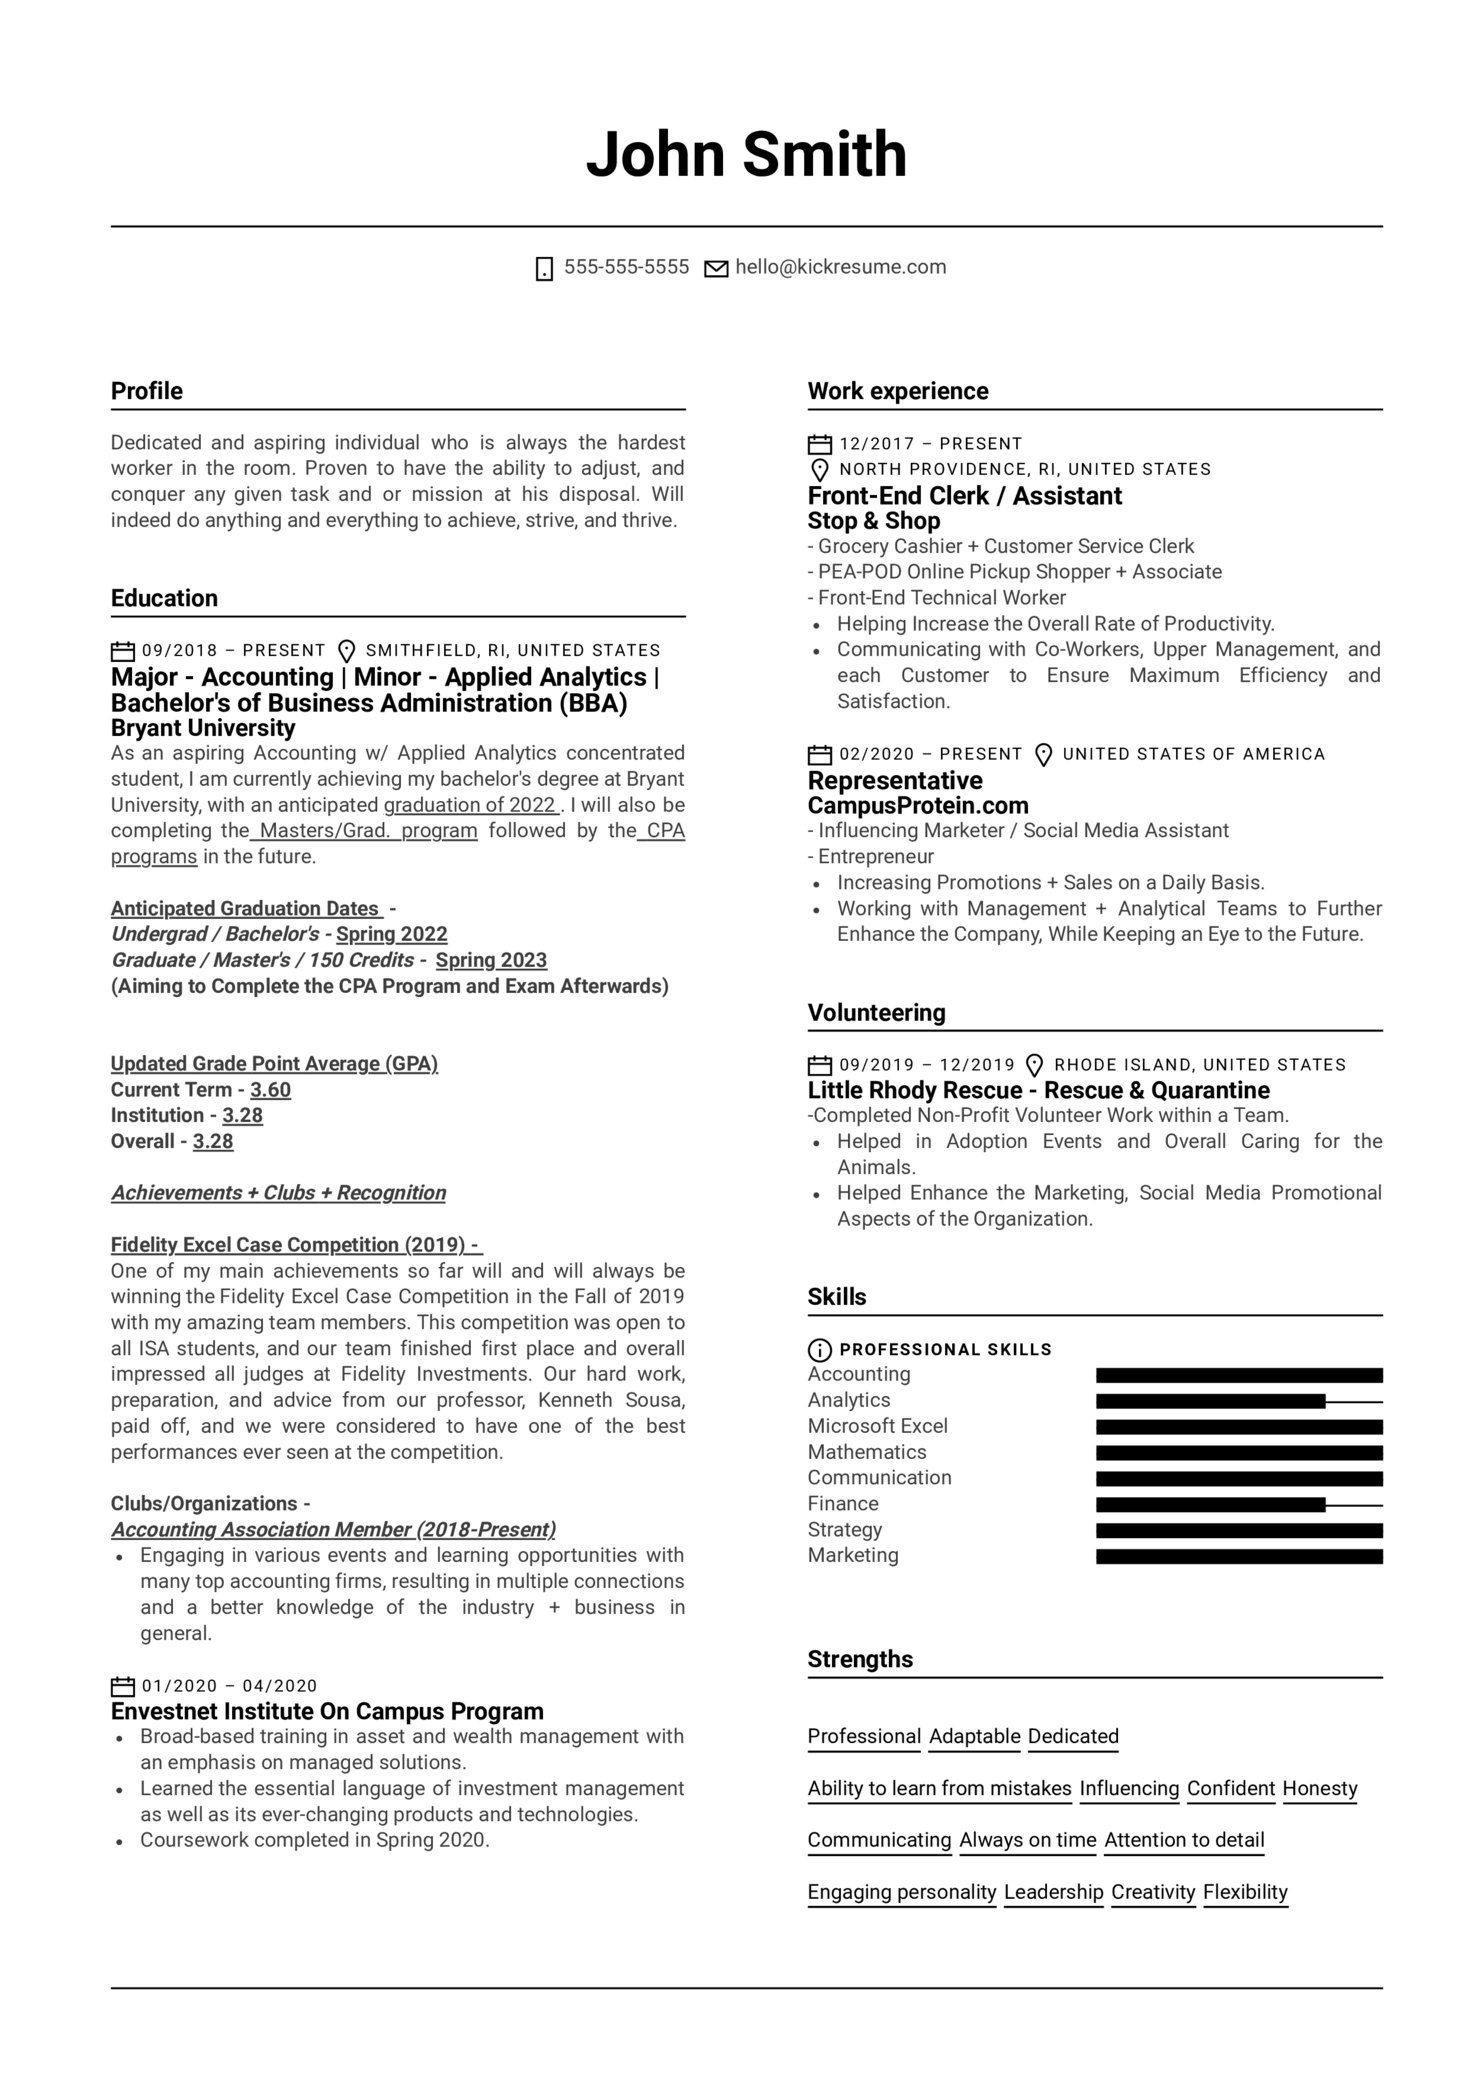 Front End Assistant at Stop & Shop Resume Sample